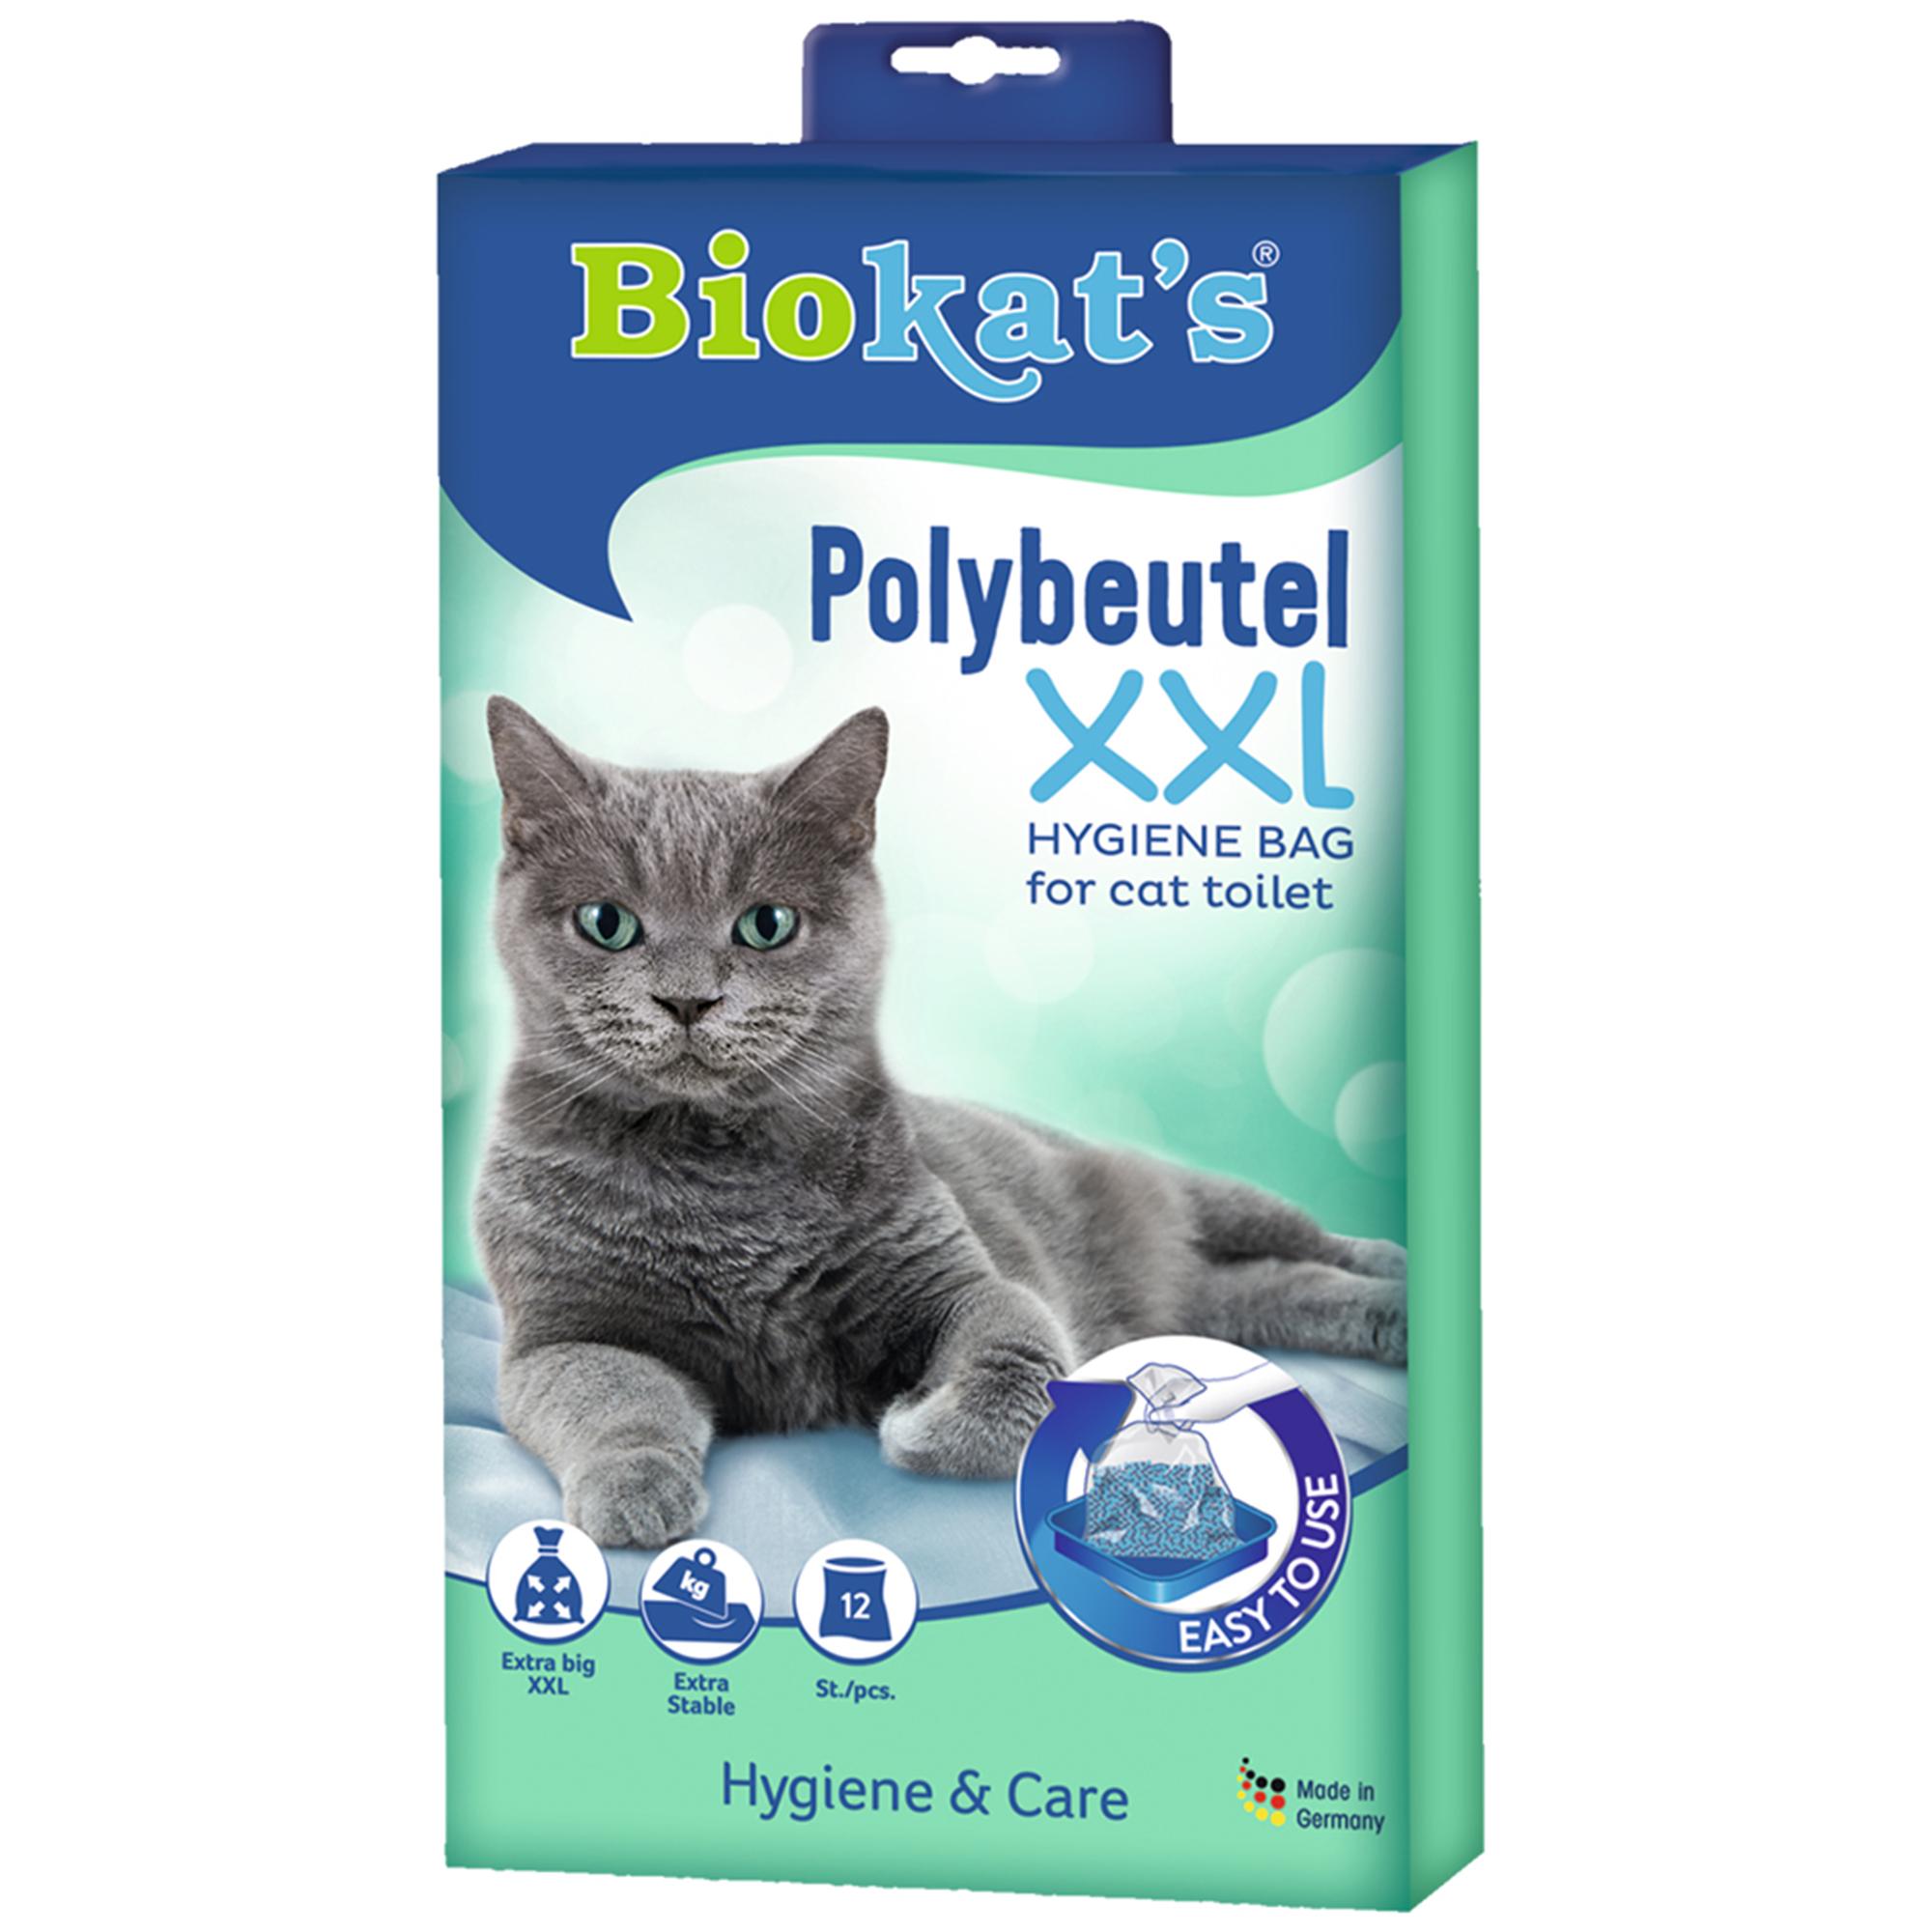 Biokat's Polybeutel XXL 12 St.